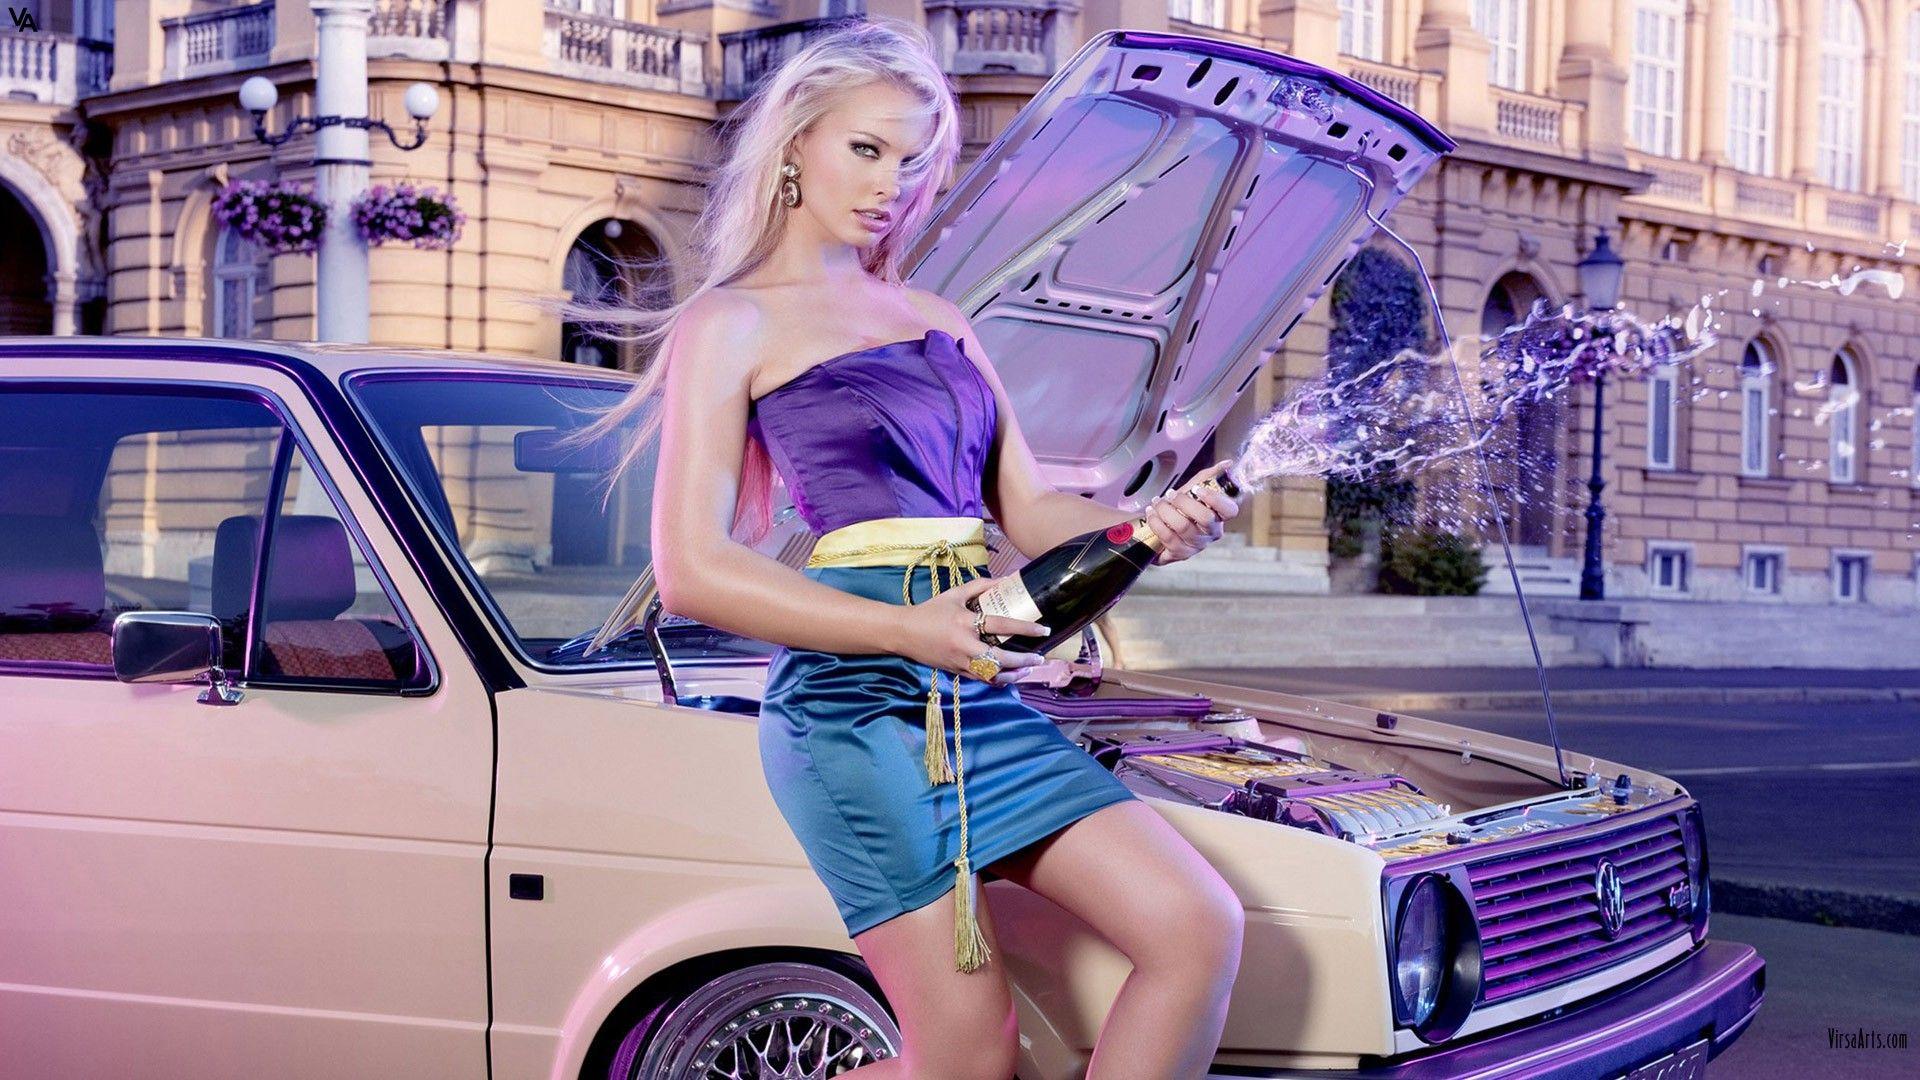 women cars Mandy Lange - Wallpaper